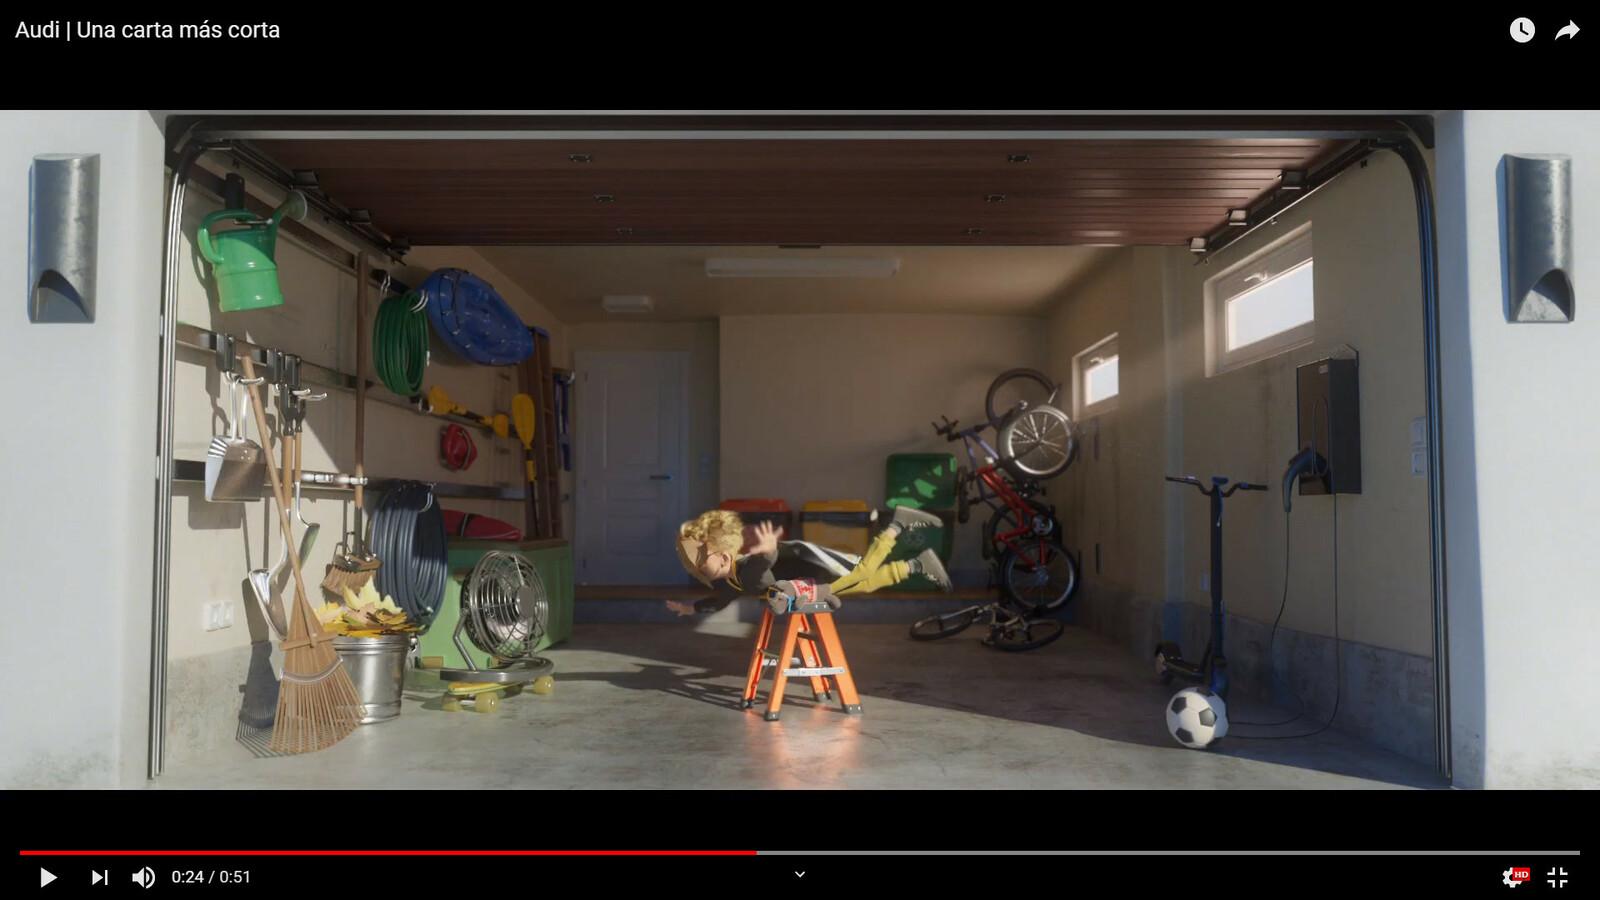 Short Animation for Audi